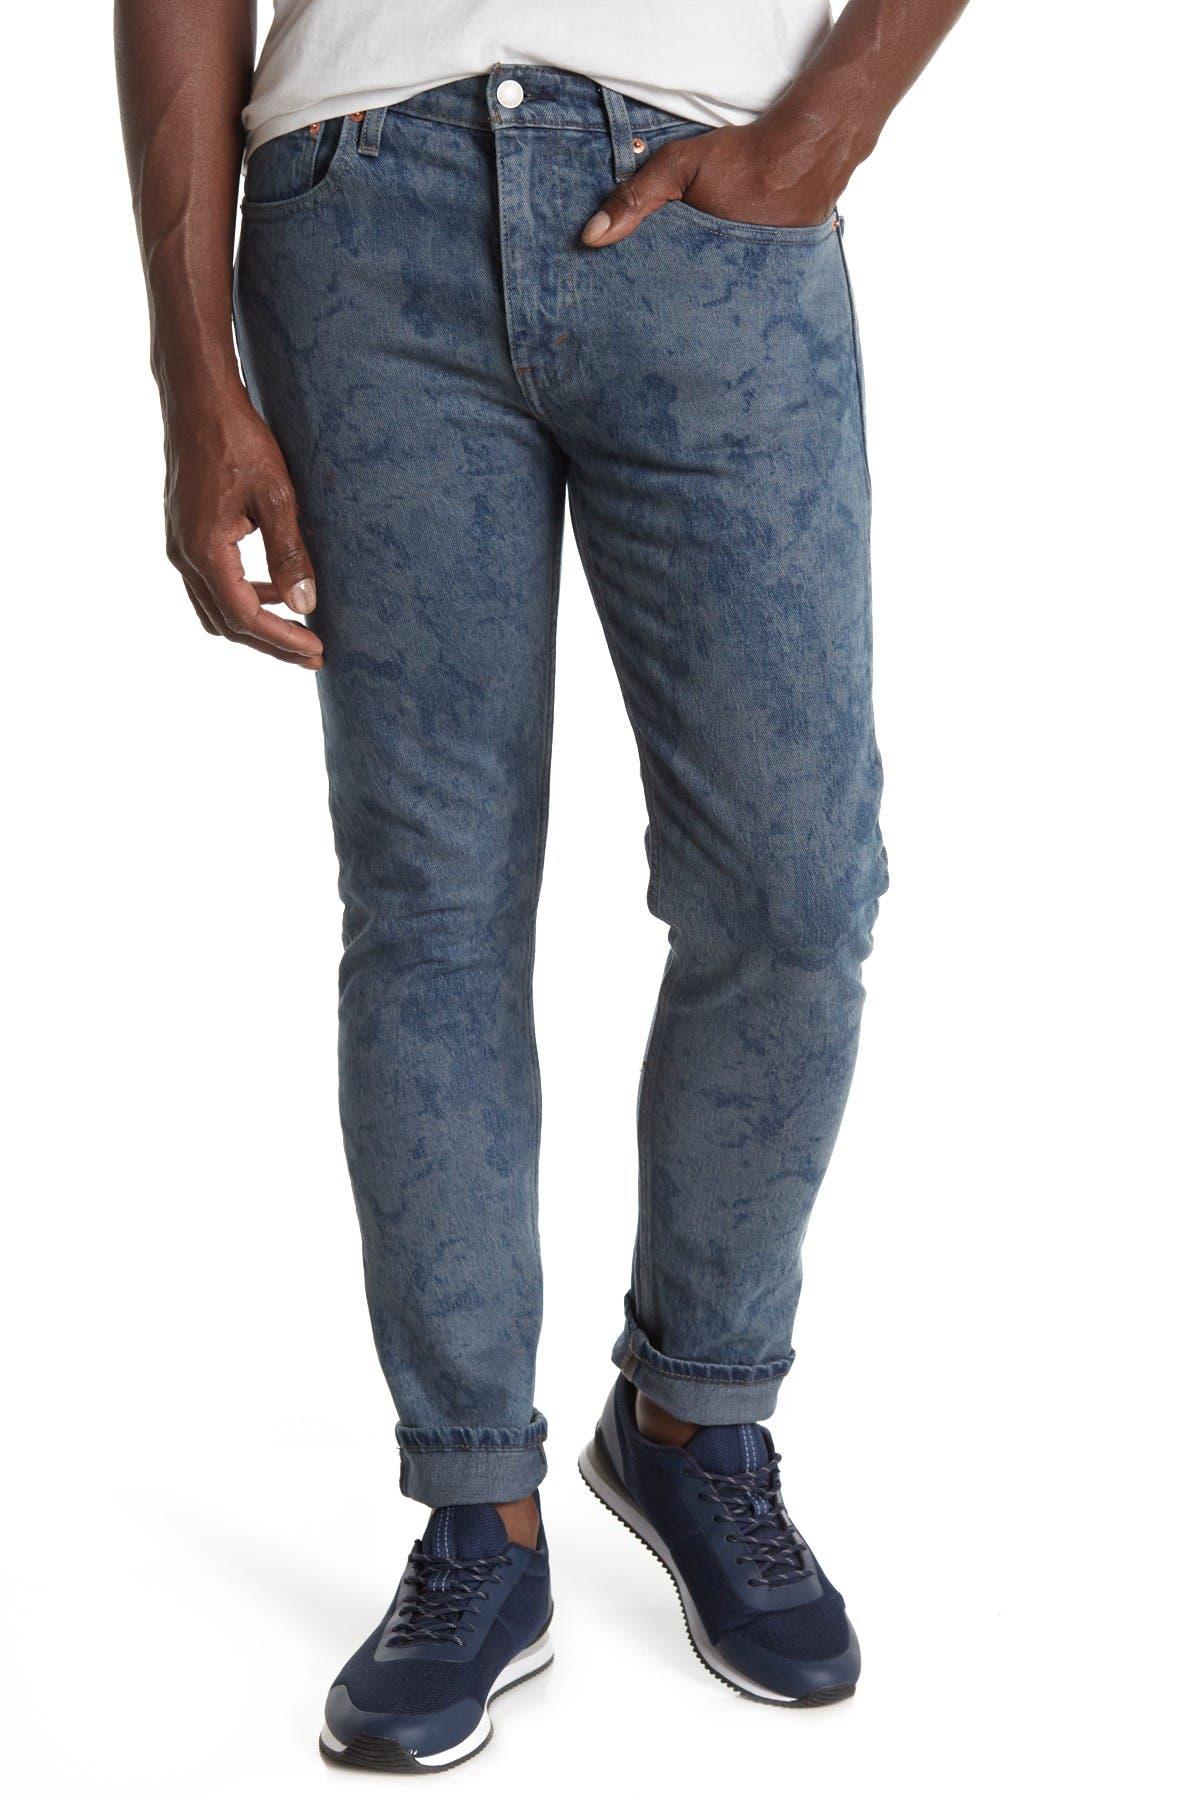 Image of Levi's 512 Slim Taper Leg Jeans